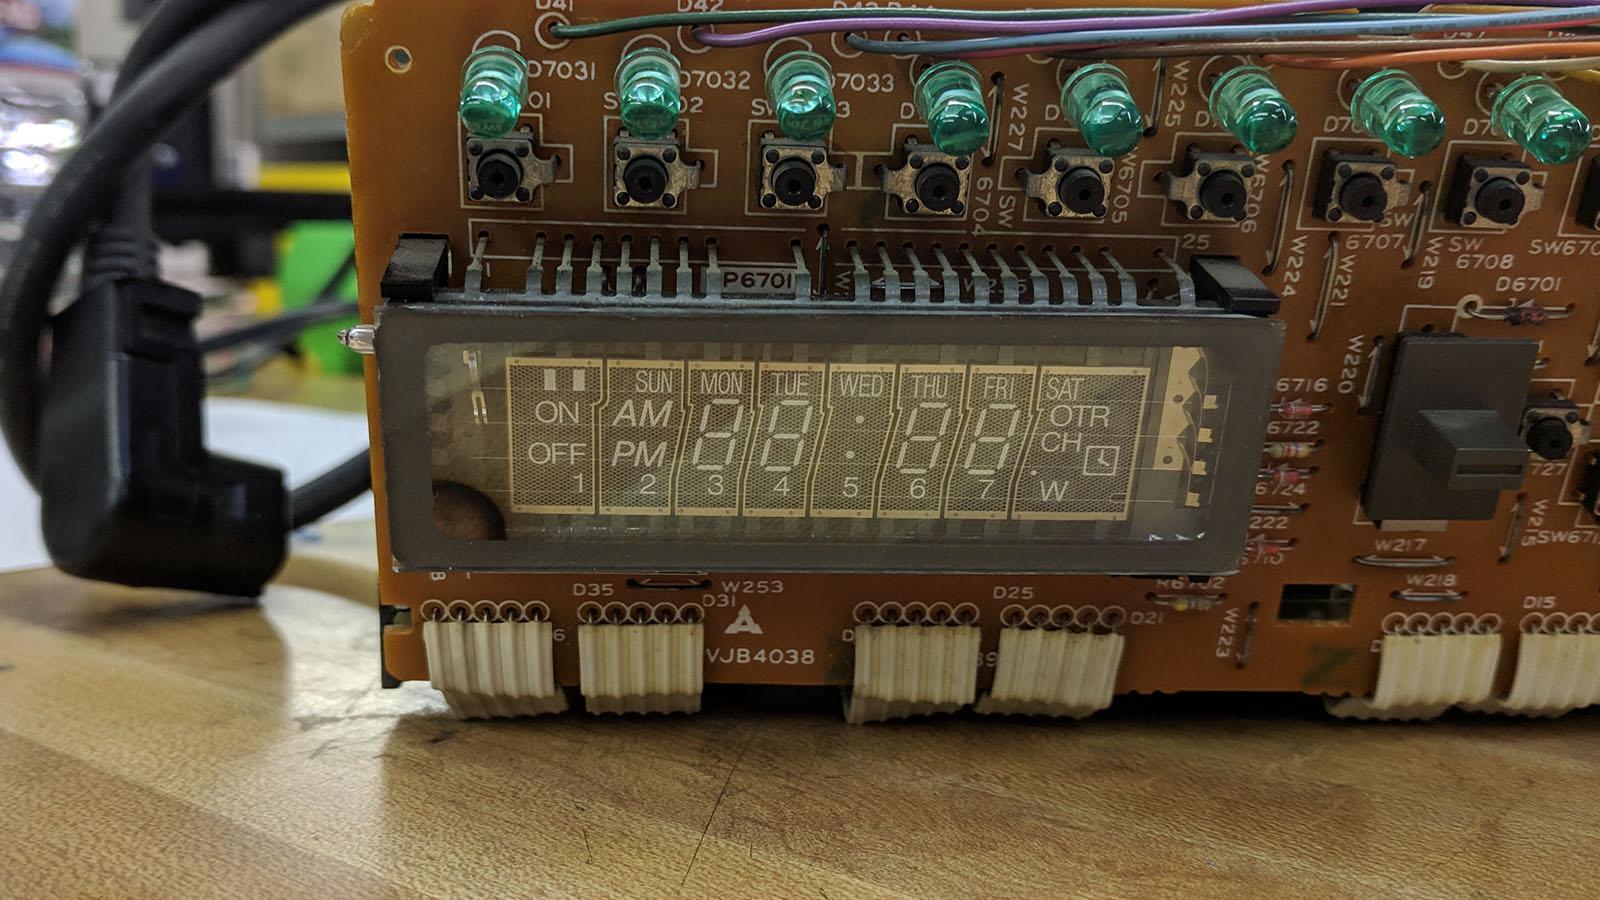 NEC VSL0010-A VFD Before